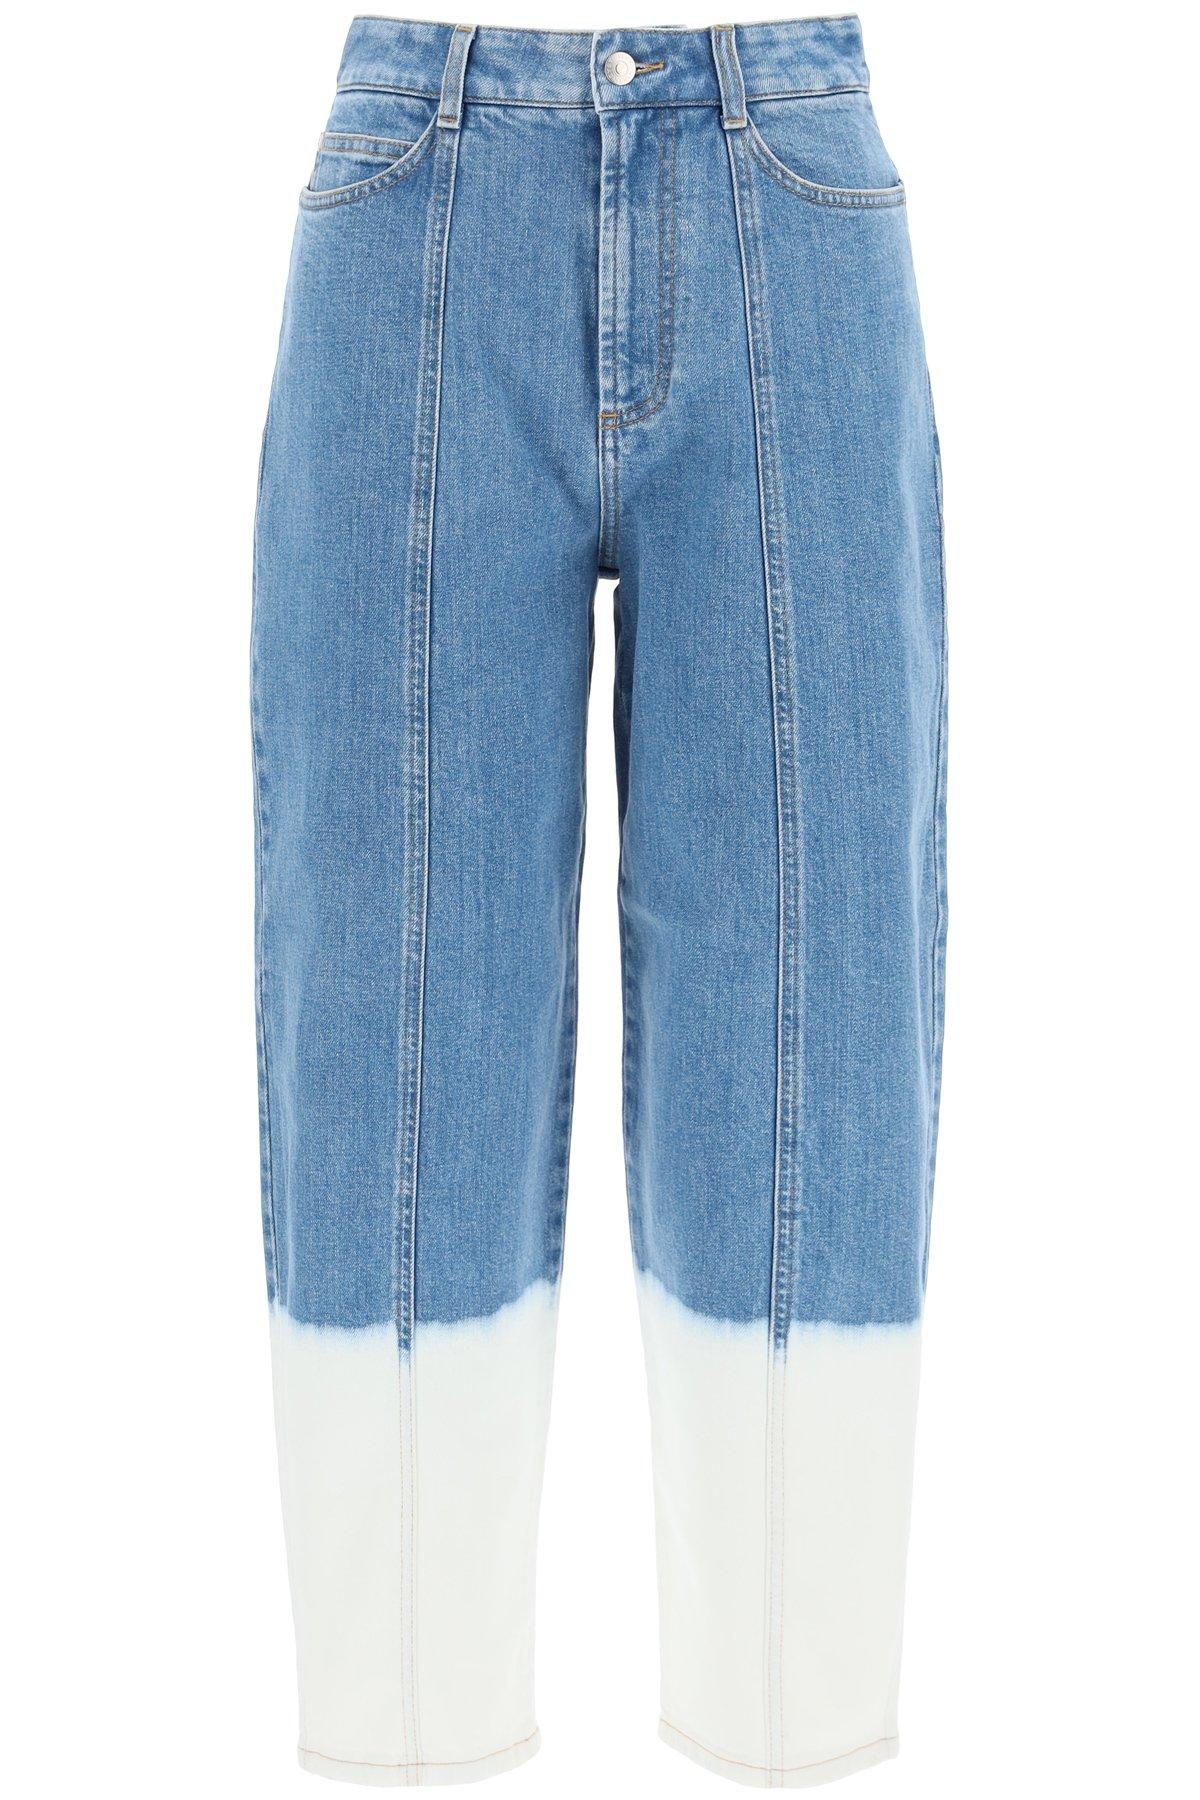 Stella mccartney jeans effetto sbiadito dip